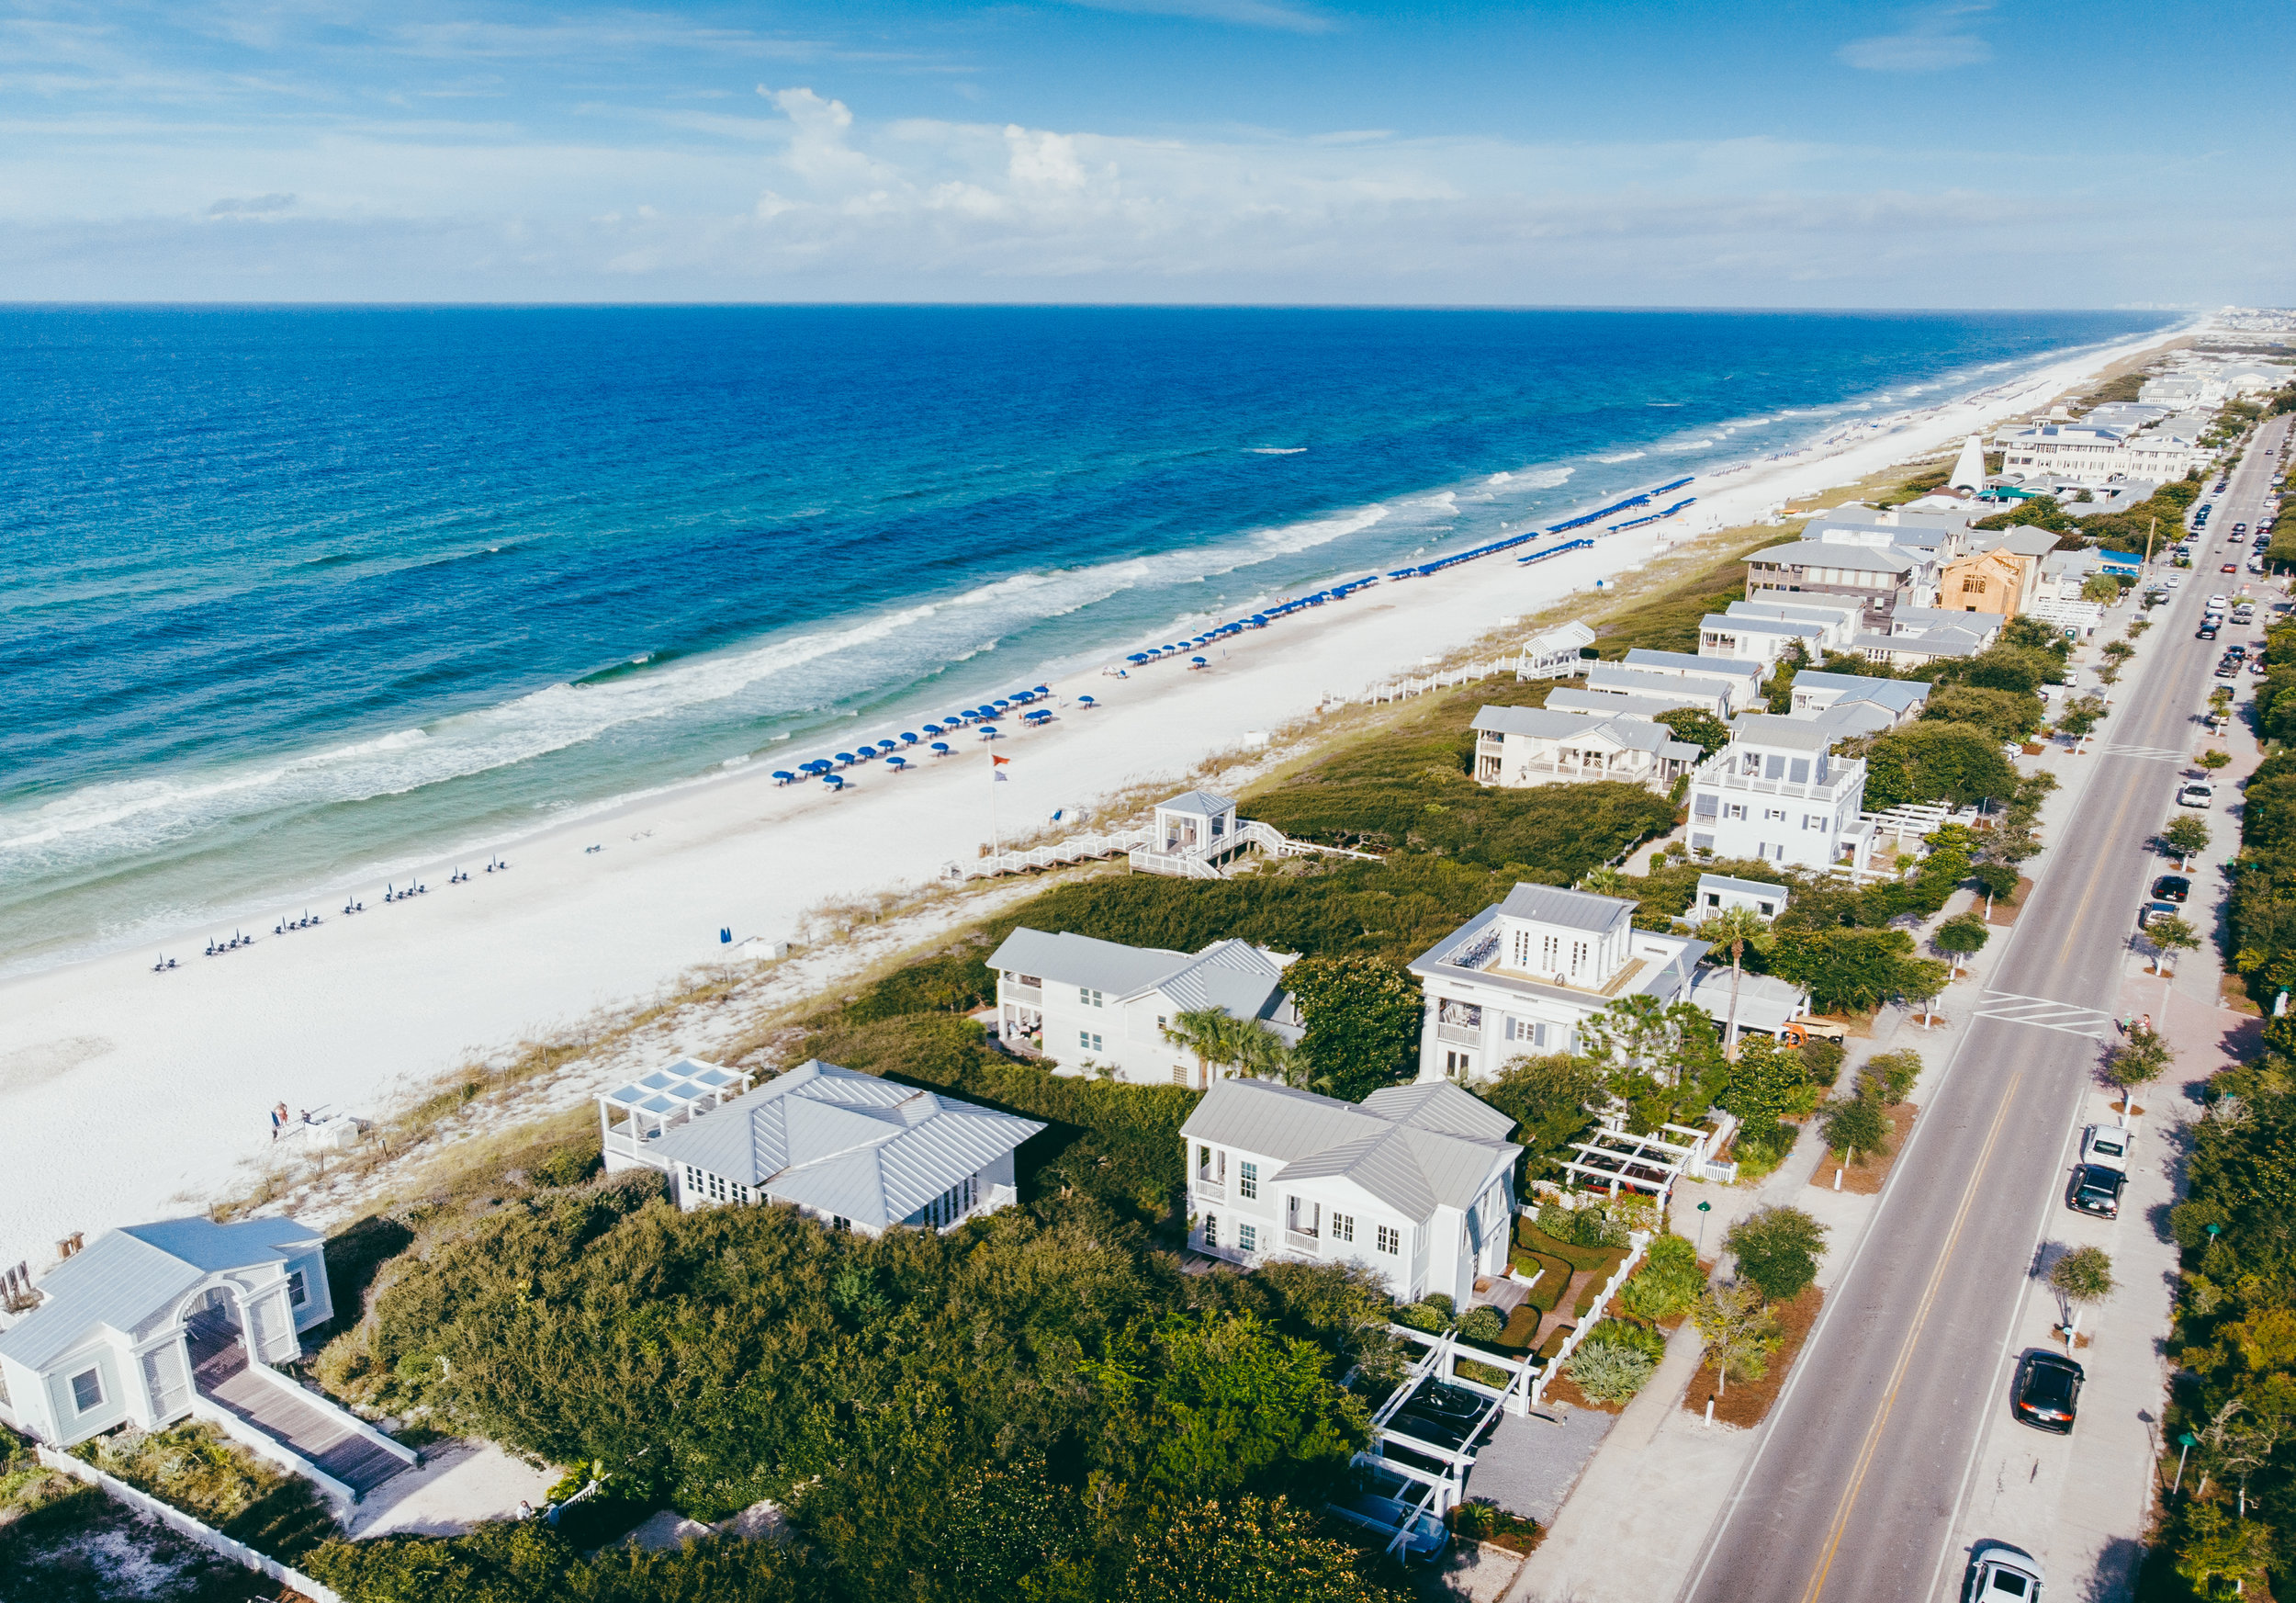 Seaside Florida Beach Escape - The Escape Artists